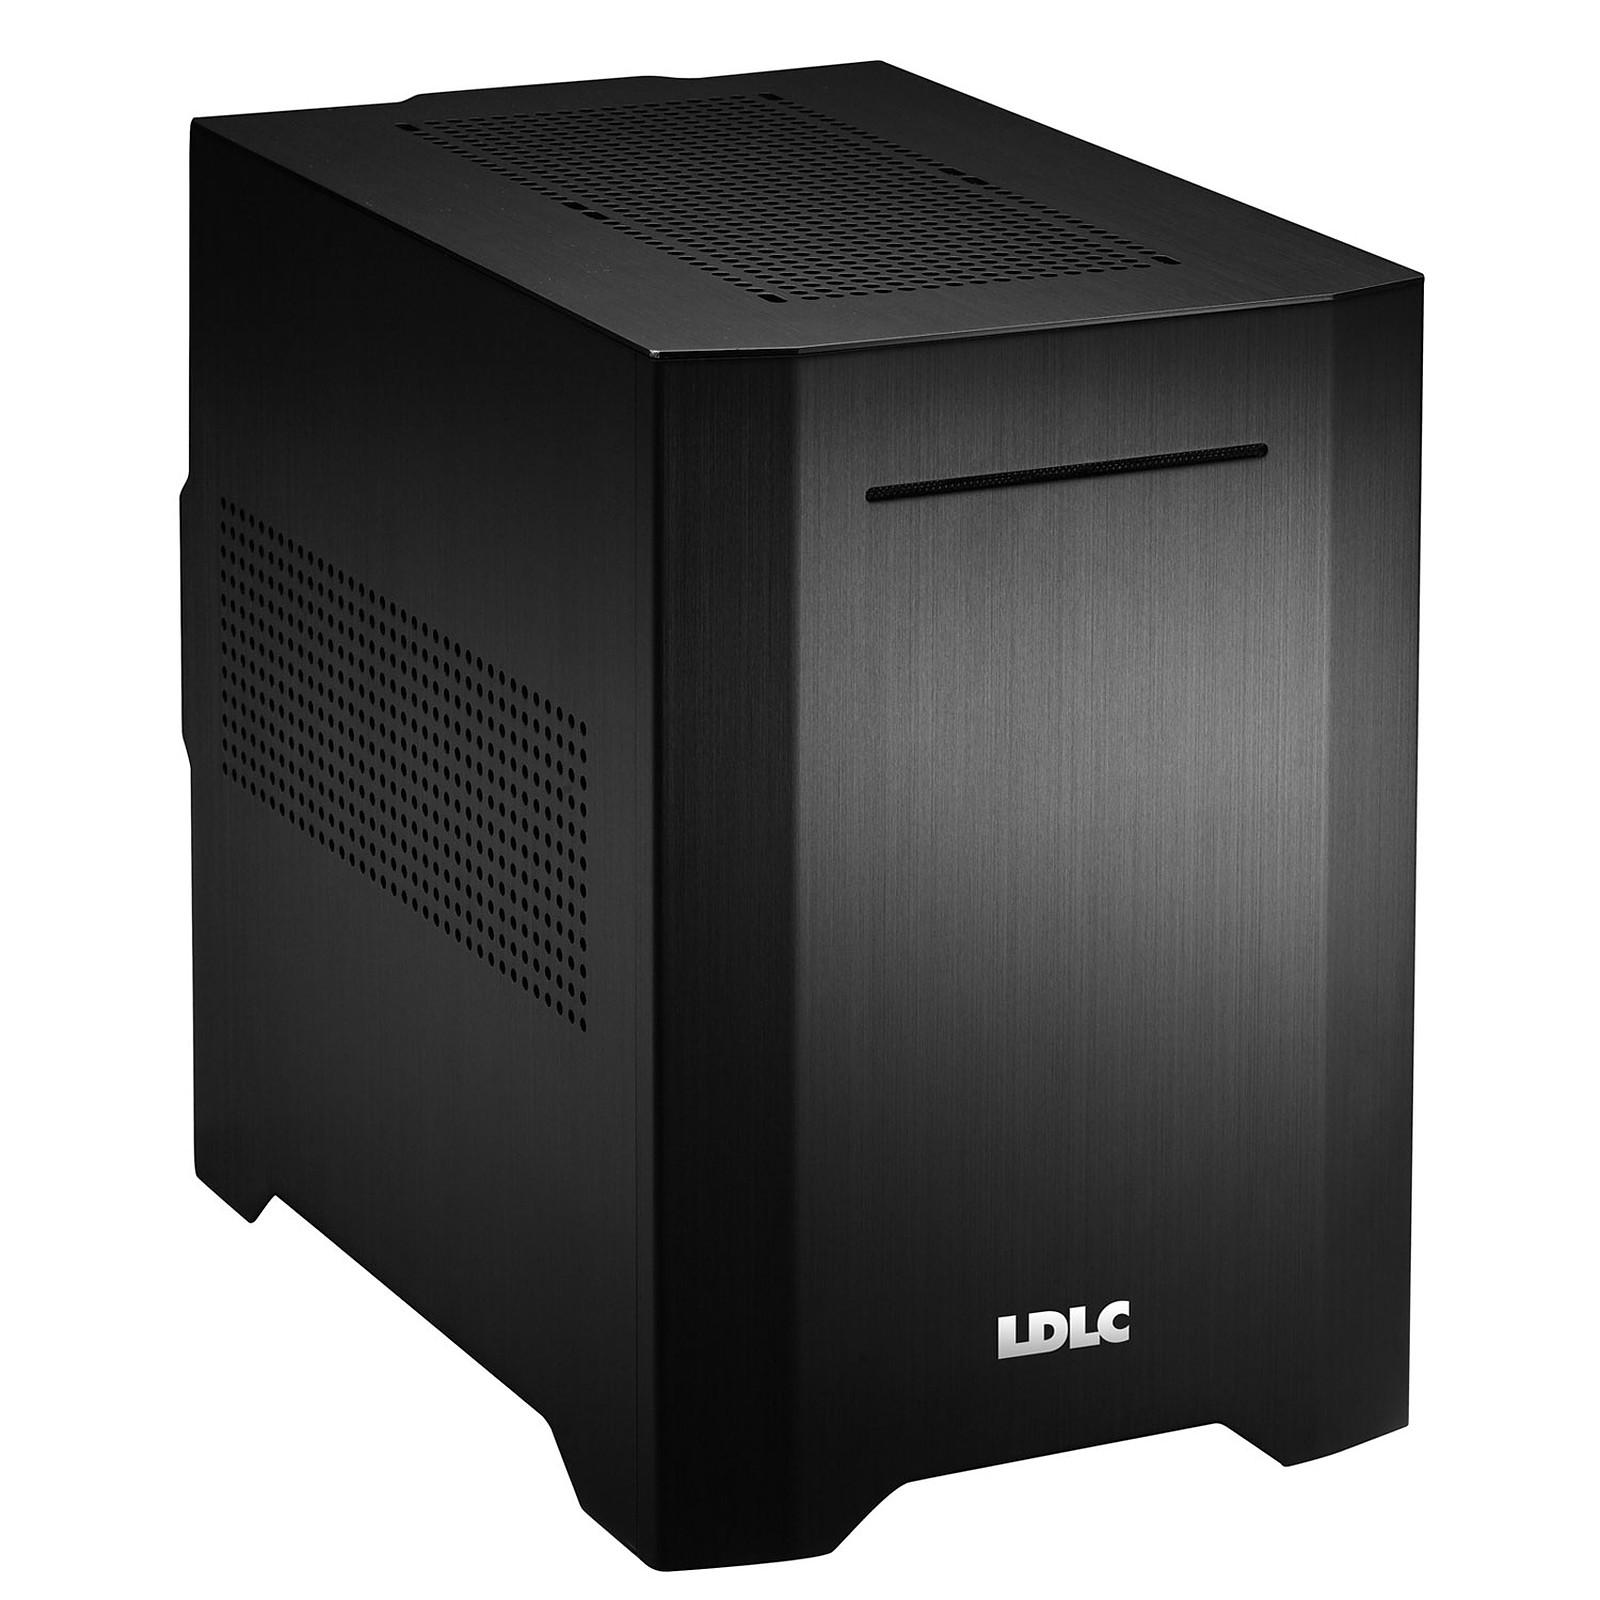 LDLC HF-1 Noir